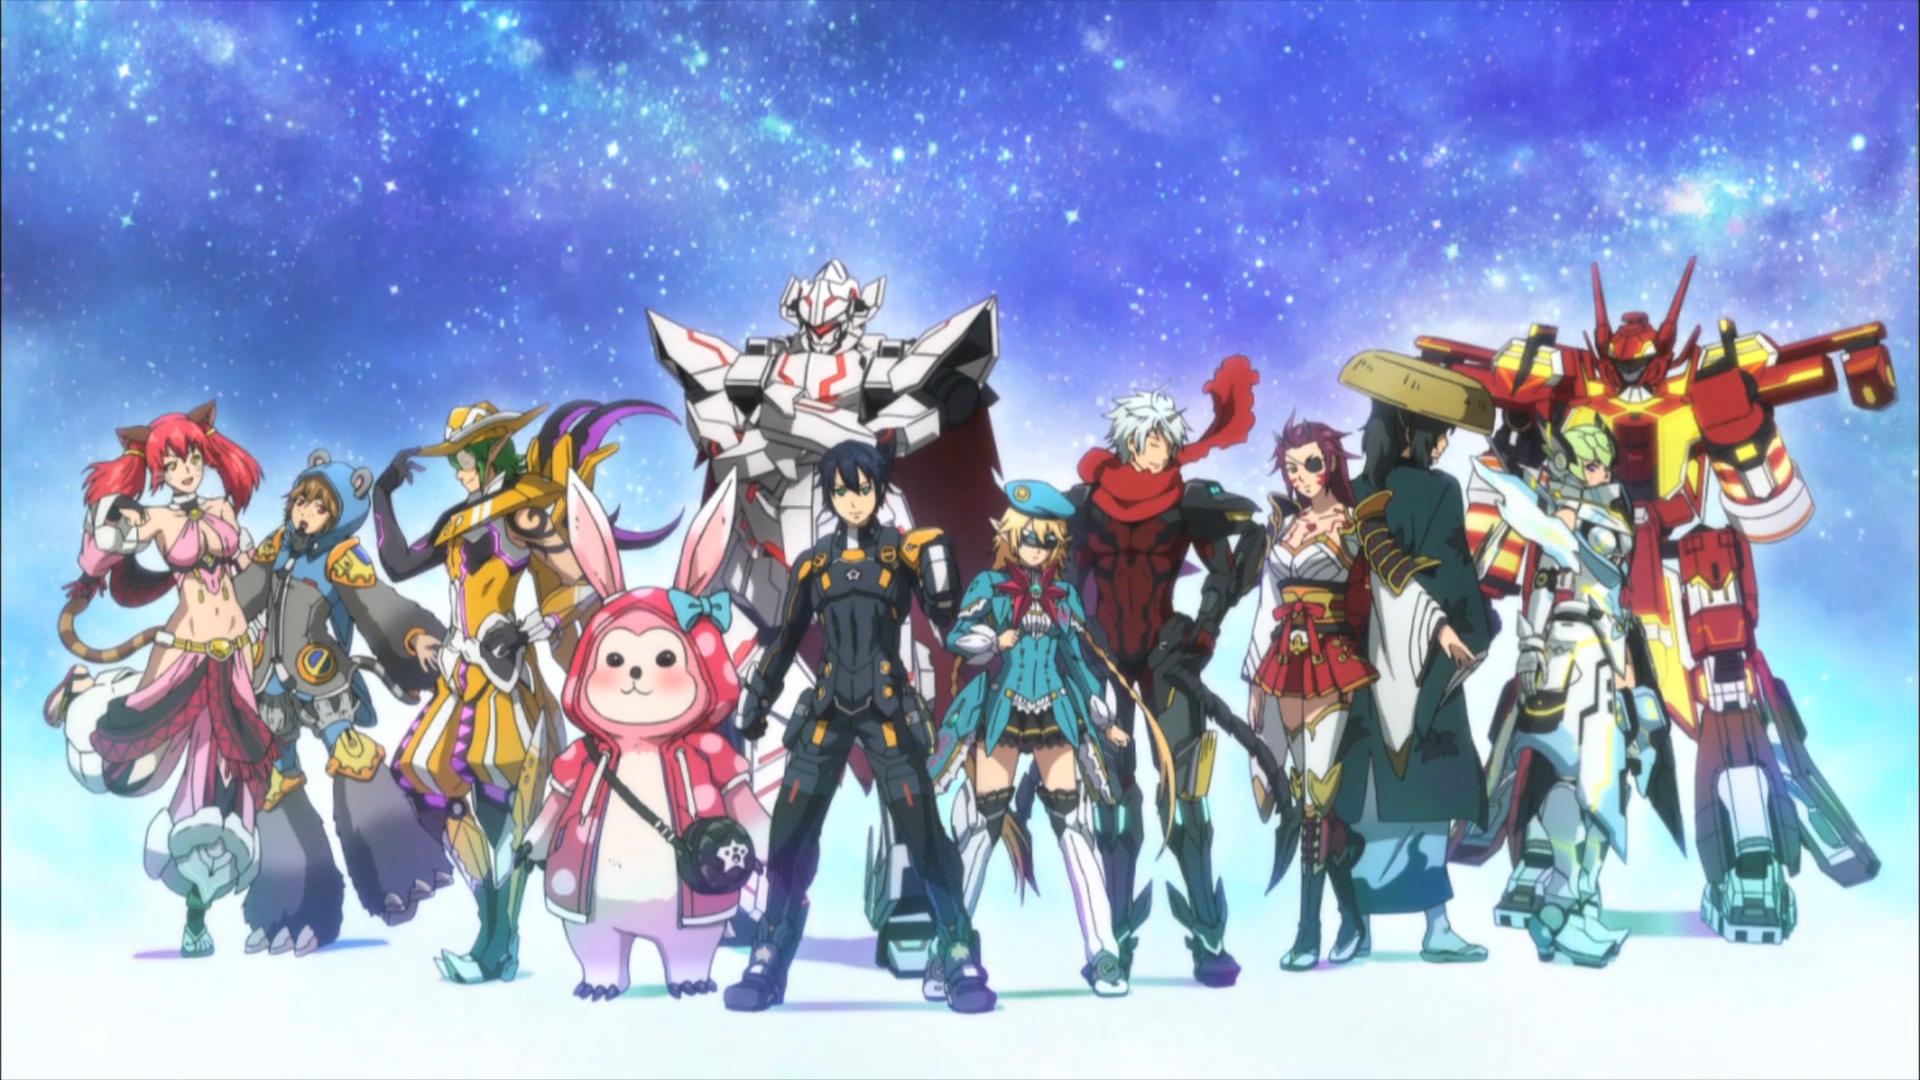 image - pso2 anime cast | phantasy star wiki | fandom powered